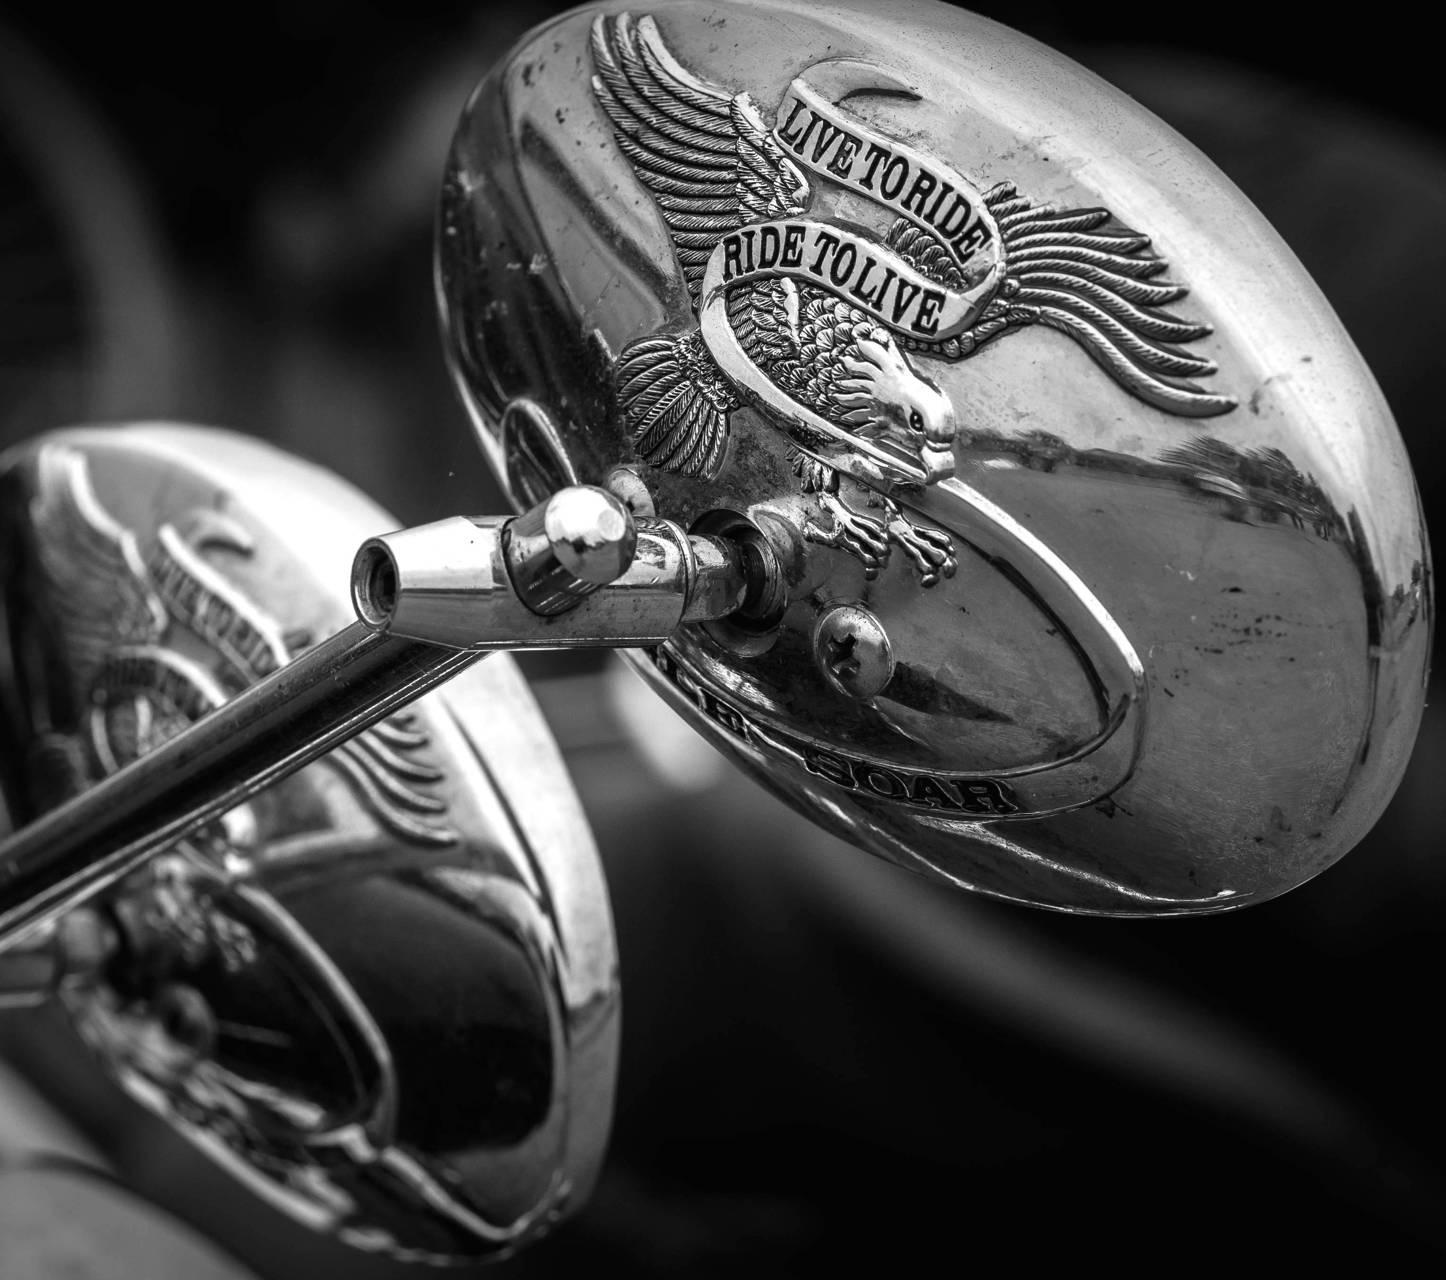 A Harley 11